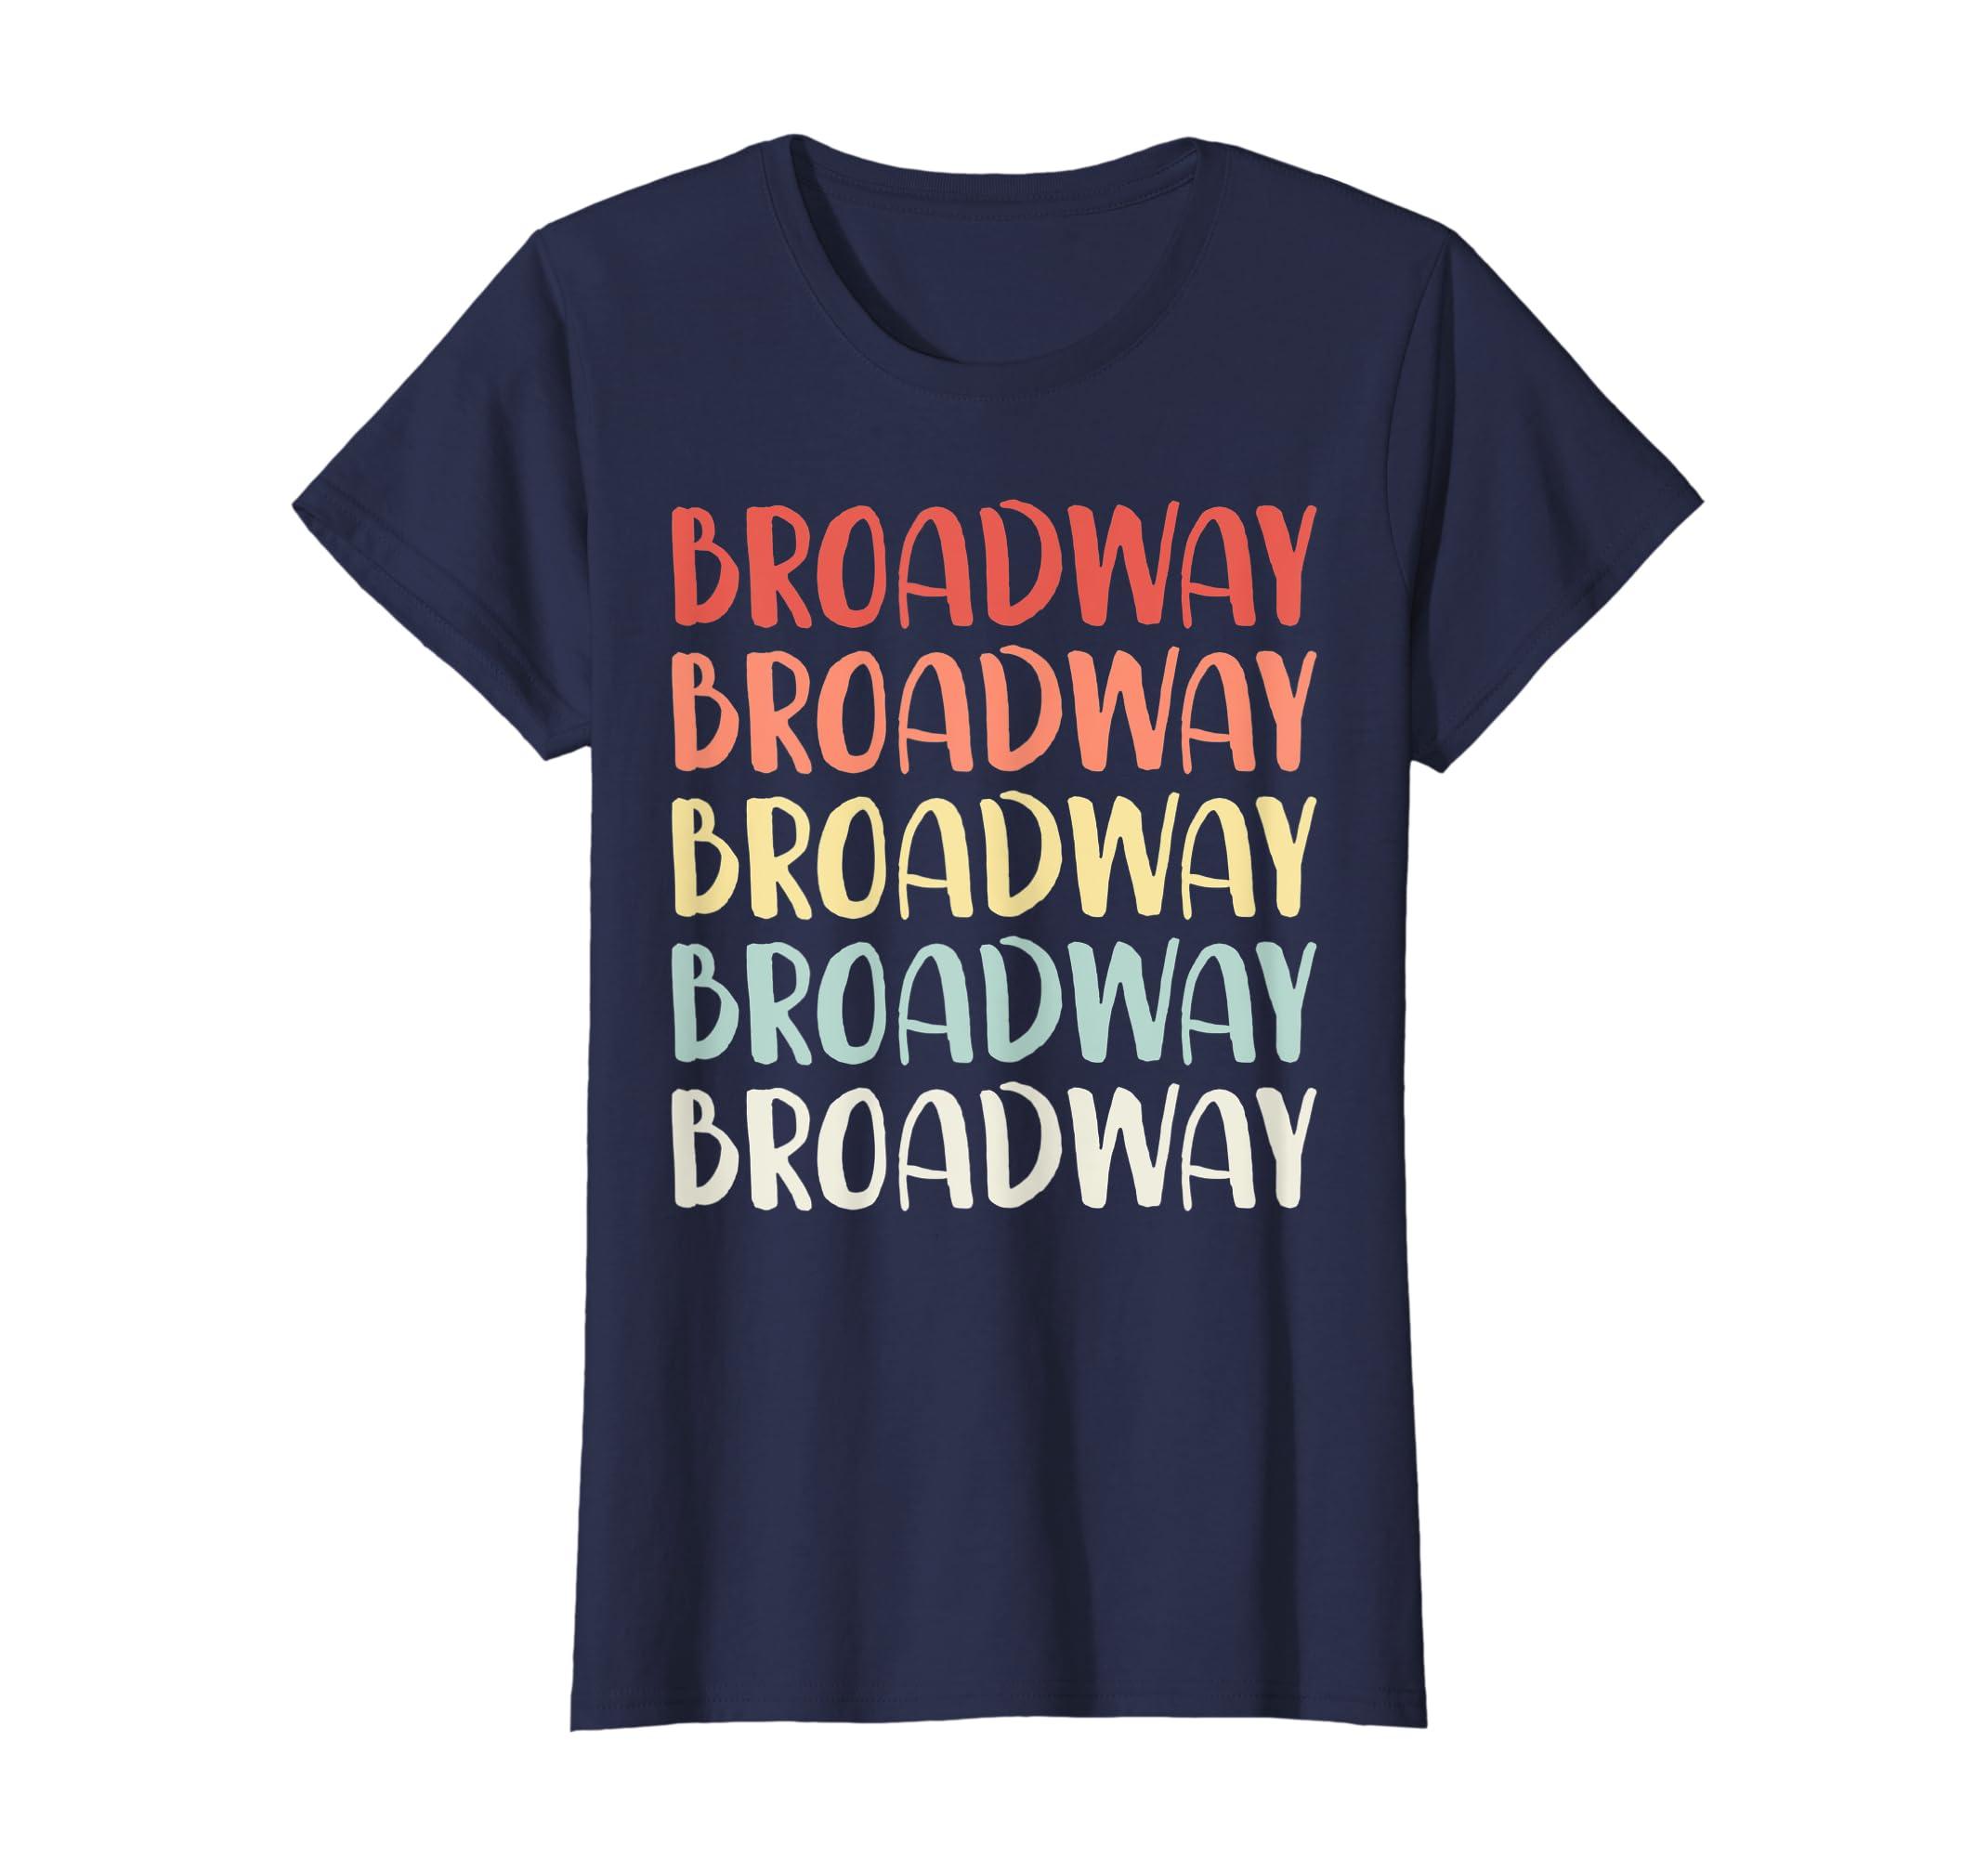 4013039f738 Amazon.com: Retro Broadway Shirt Vintage Broadway Theater T-Shirt Gift:  Clothing